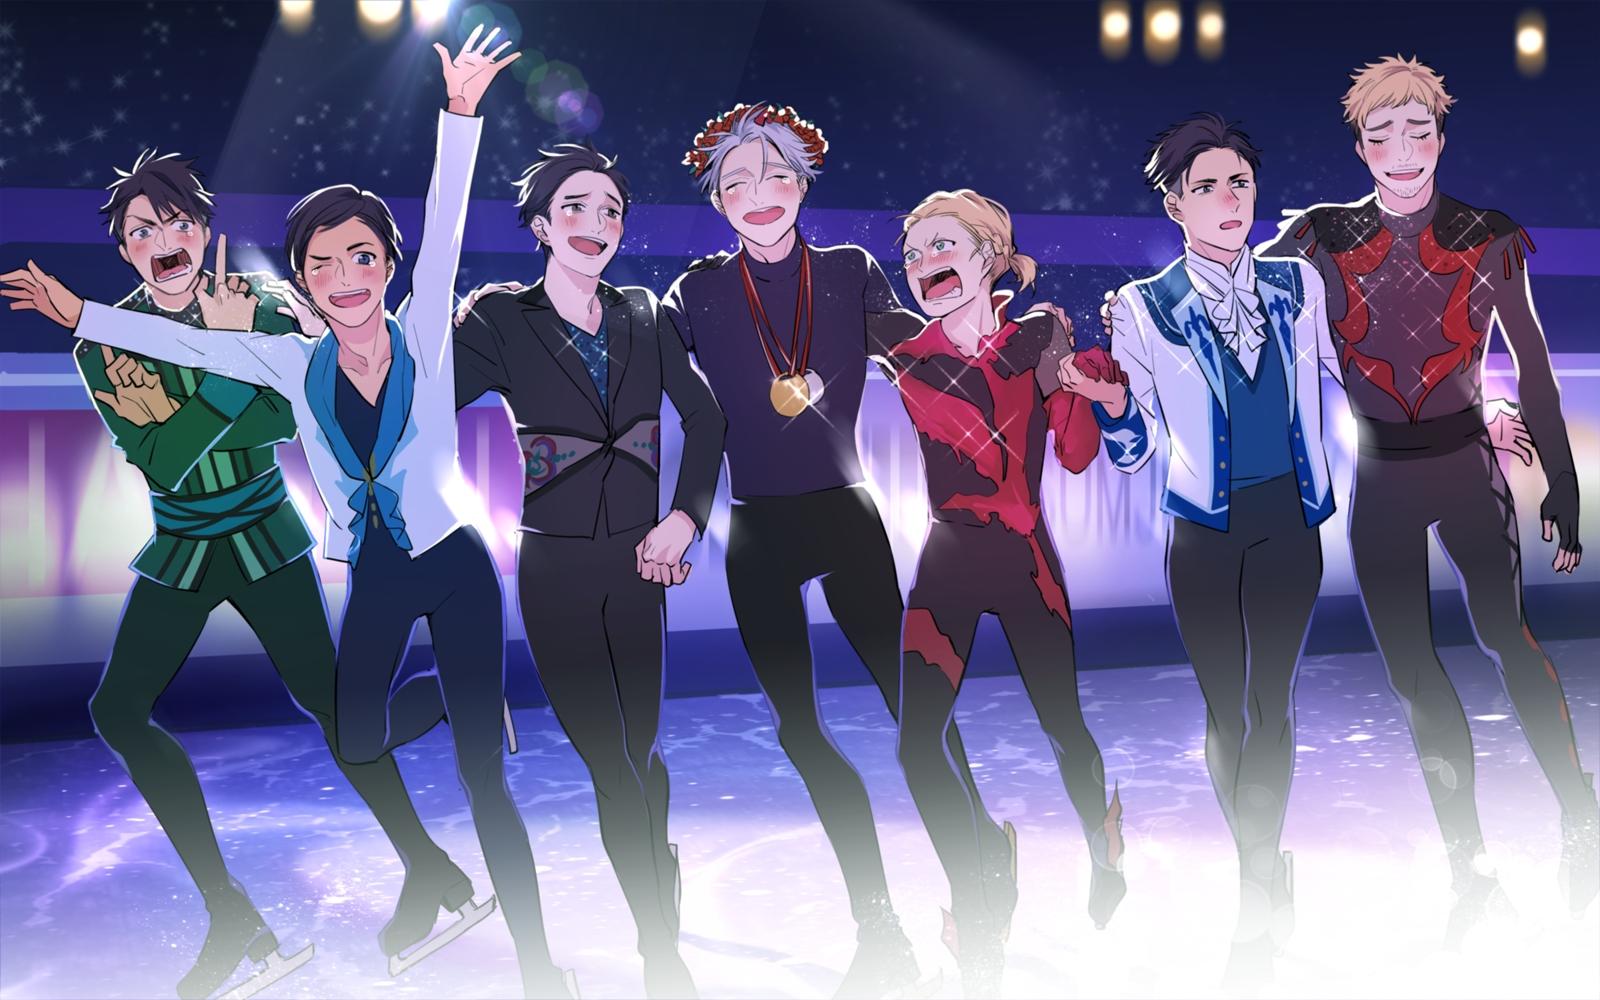 On Ice Download Yuri Image